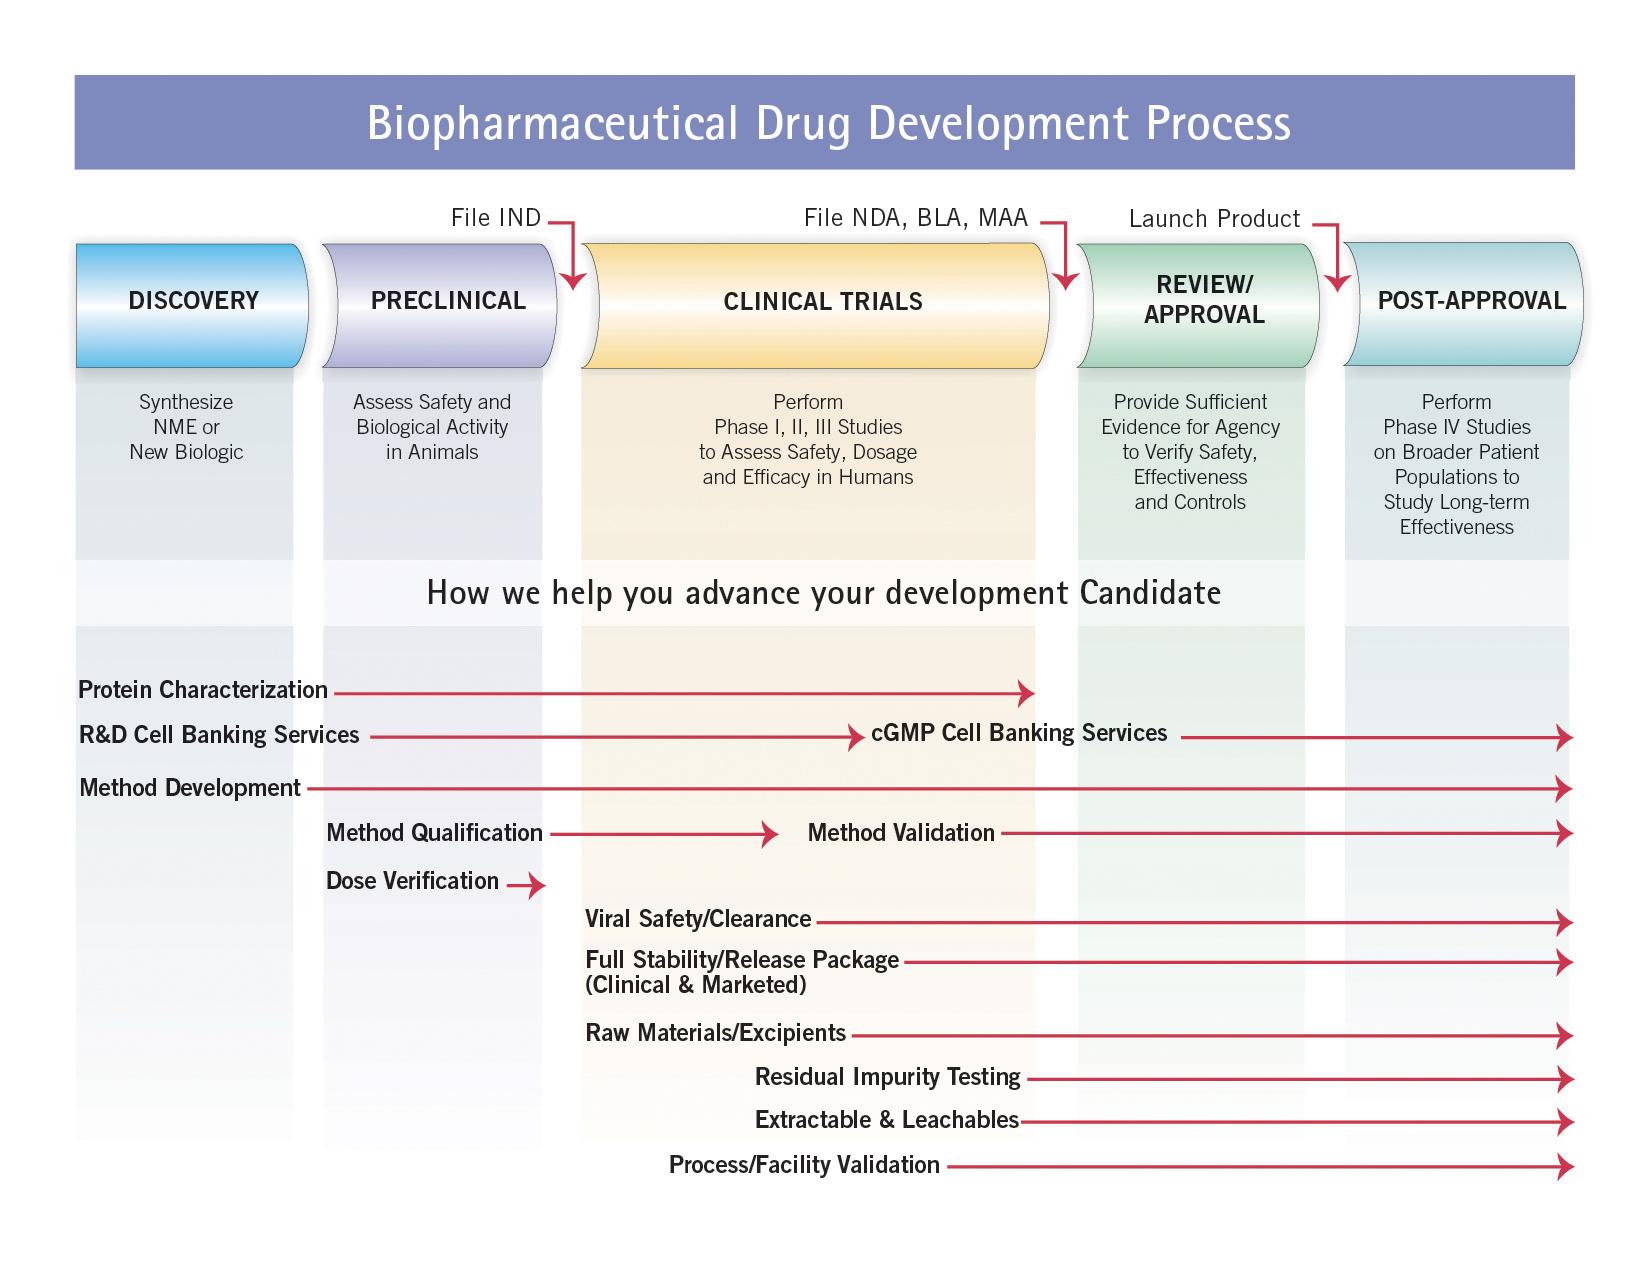 Biopharmaceutical Drug Development Process